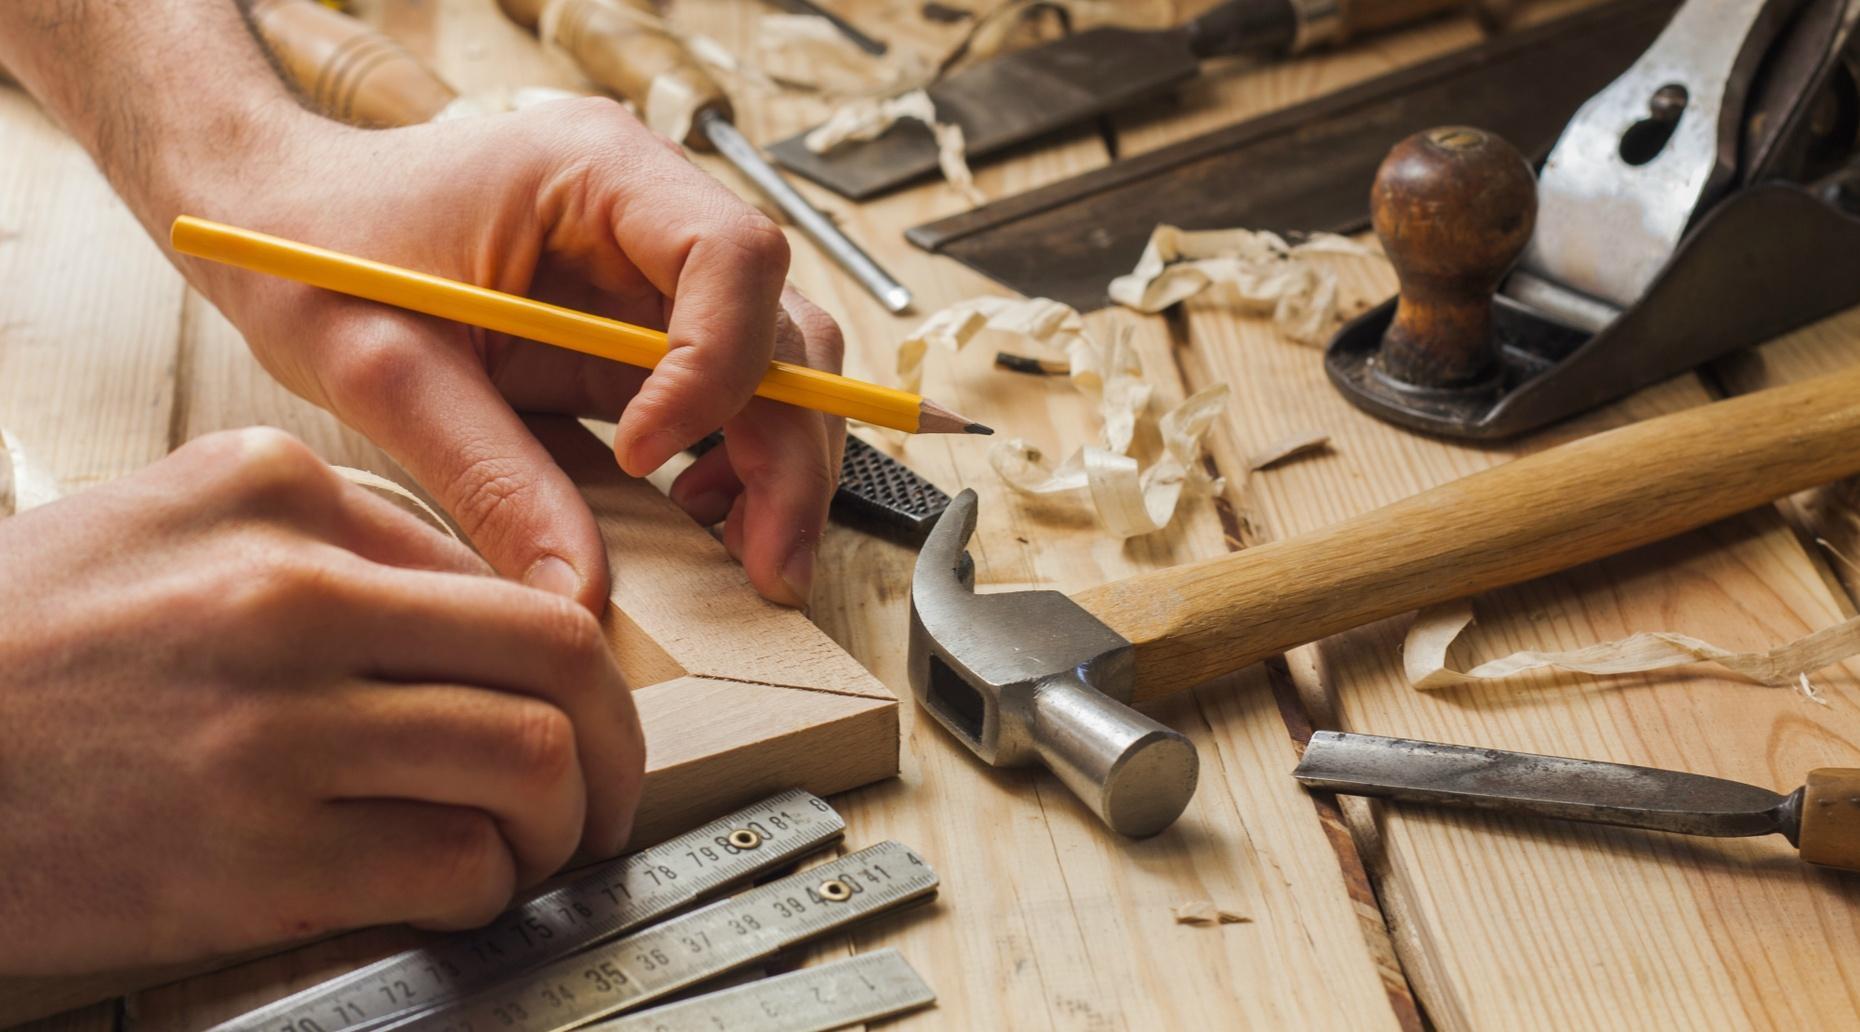 Wood-Working Orientation Class in Denver